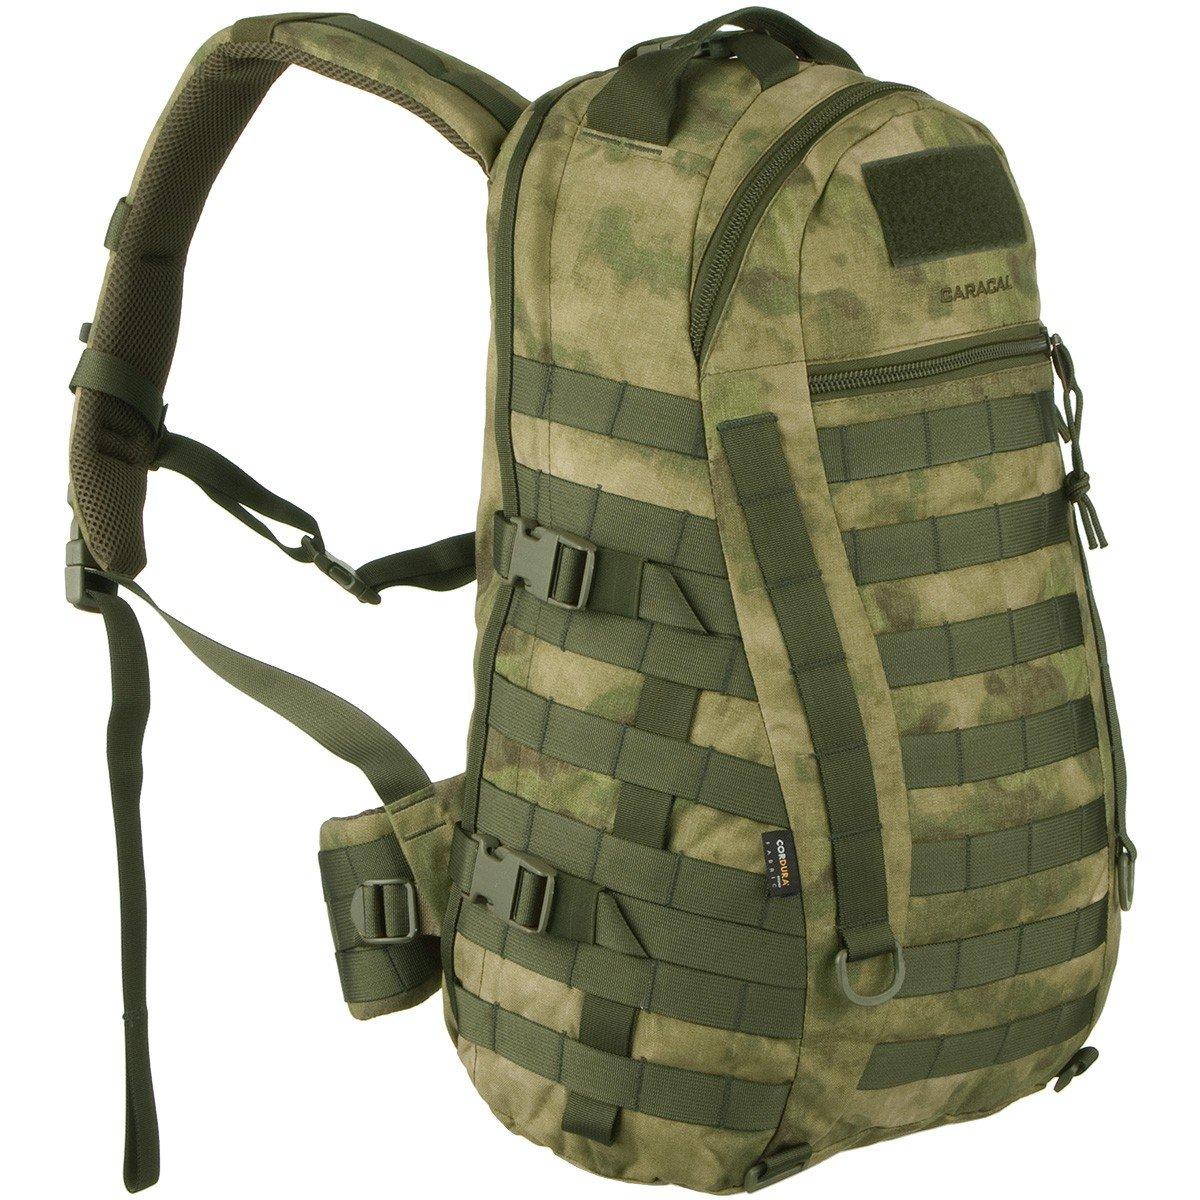 W!SPORT® CARACAL Rucksack 25 Liter (Militär Cordura MOLLE Marschrucksack Outdoor Camping Abenteuer)